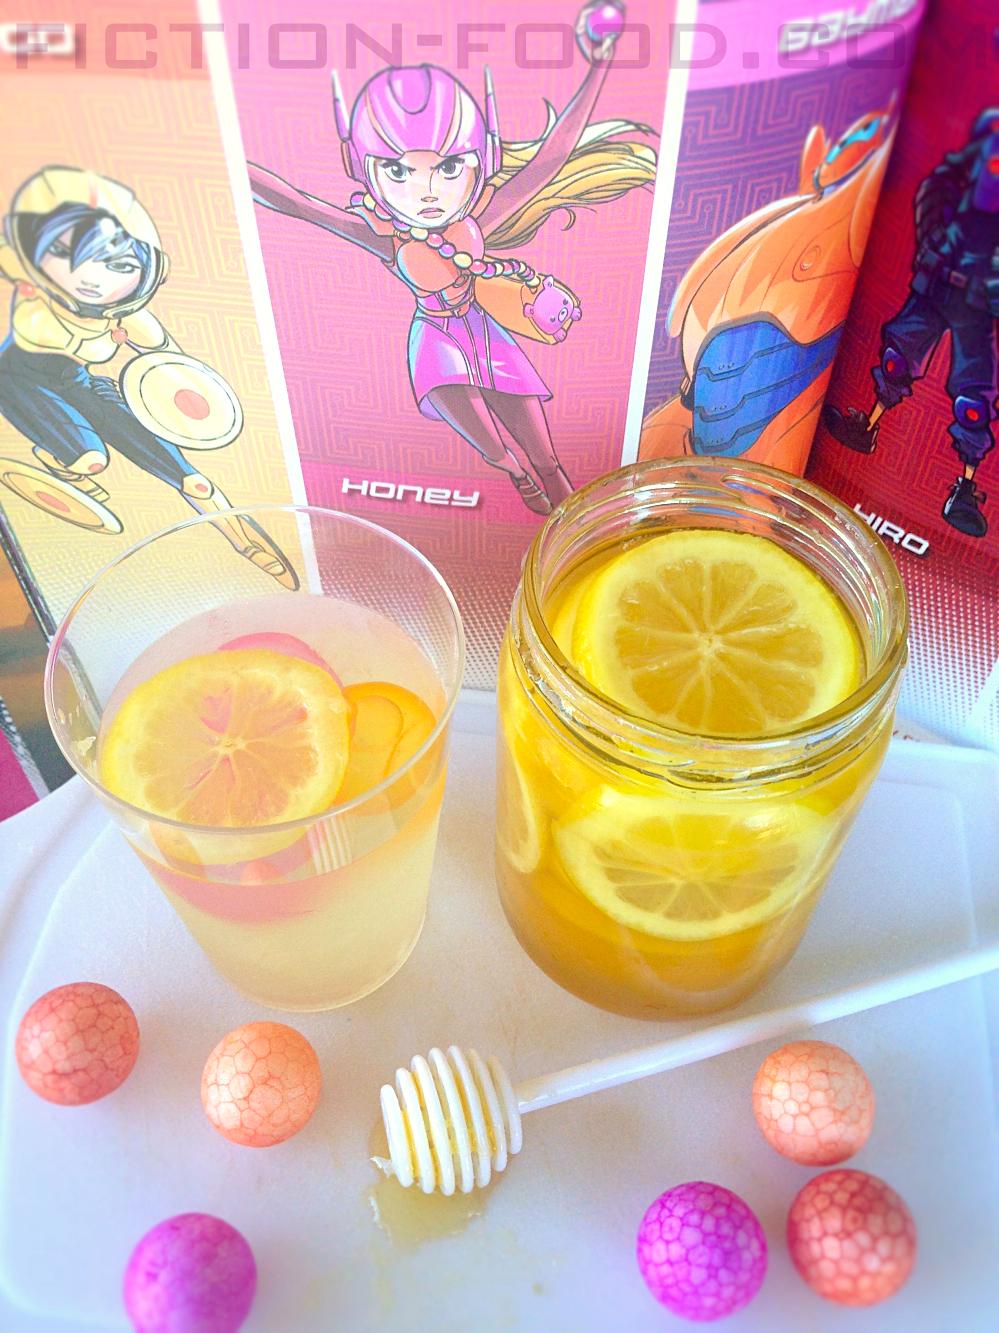 Honey Lemon Big Hero 6 Comic